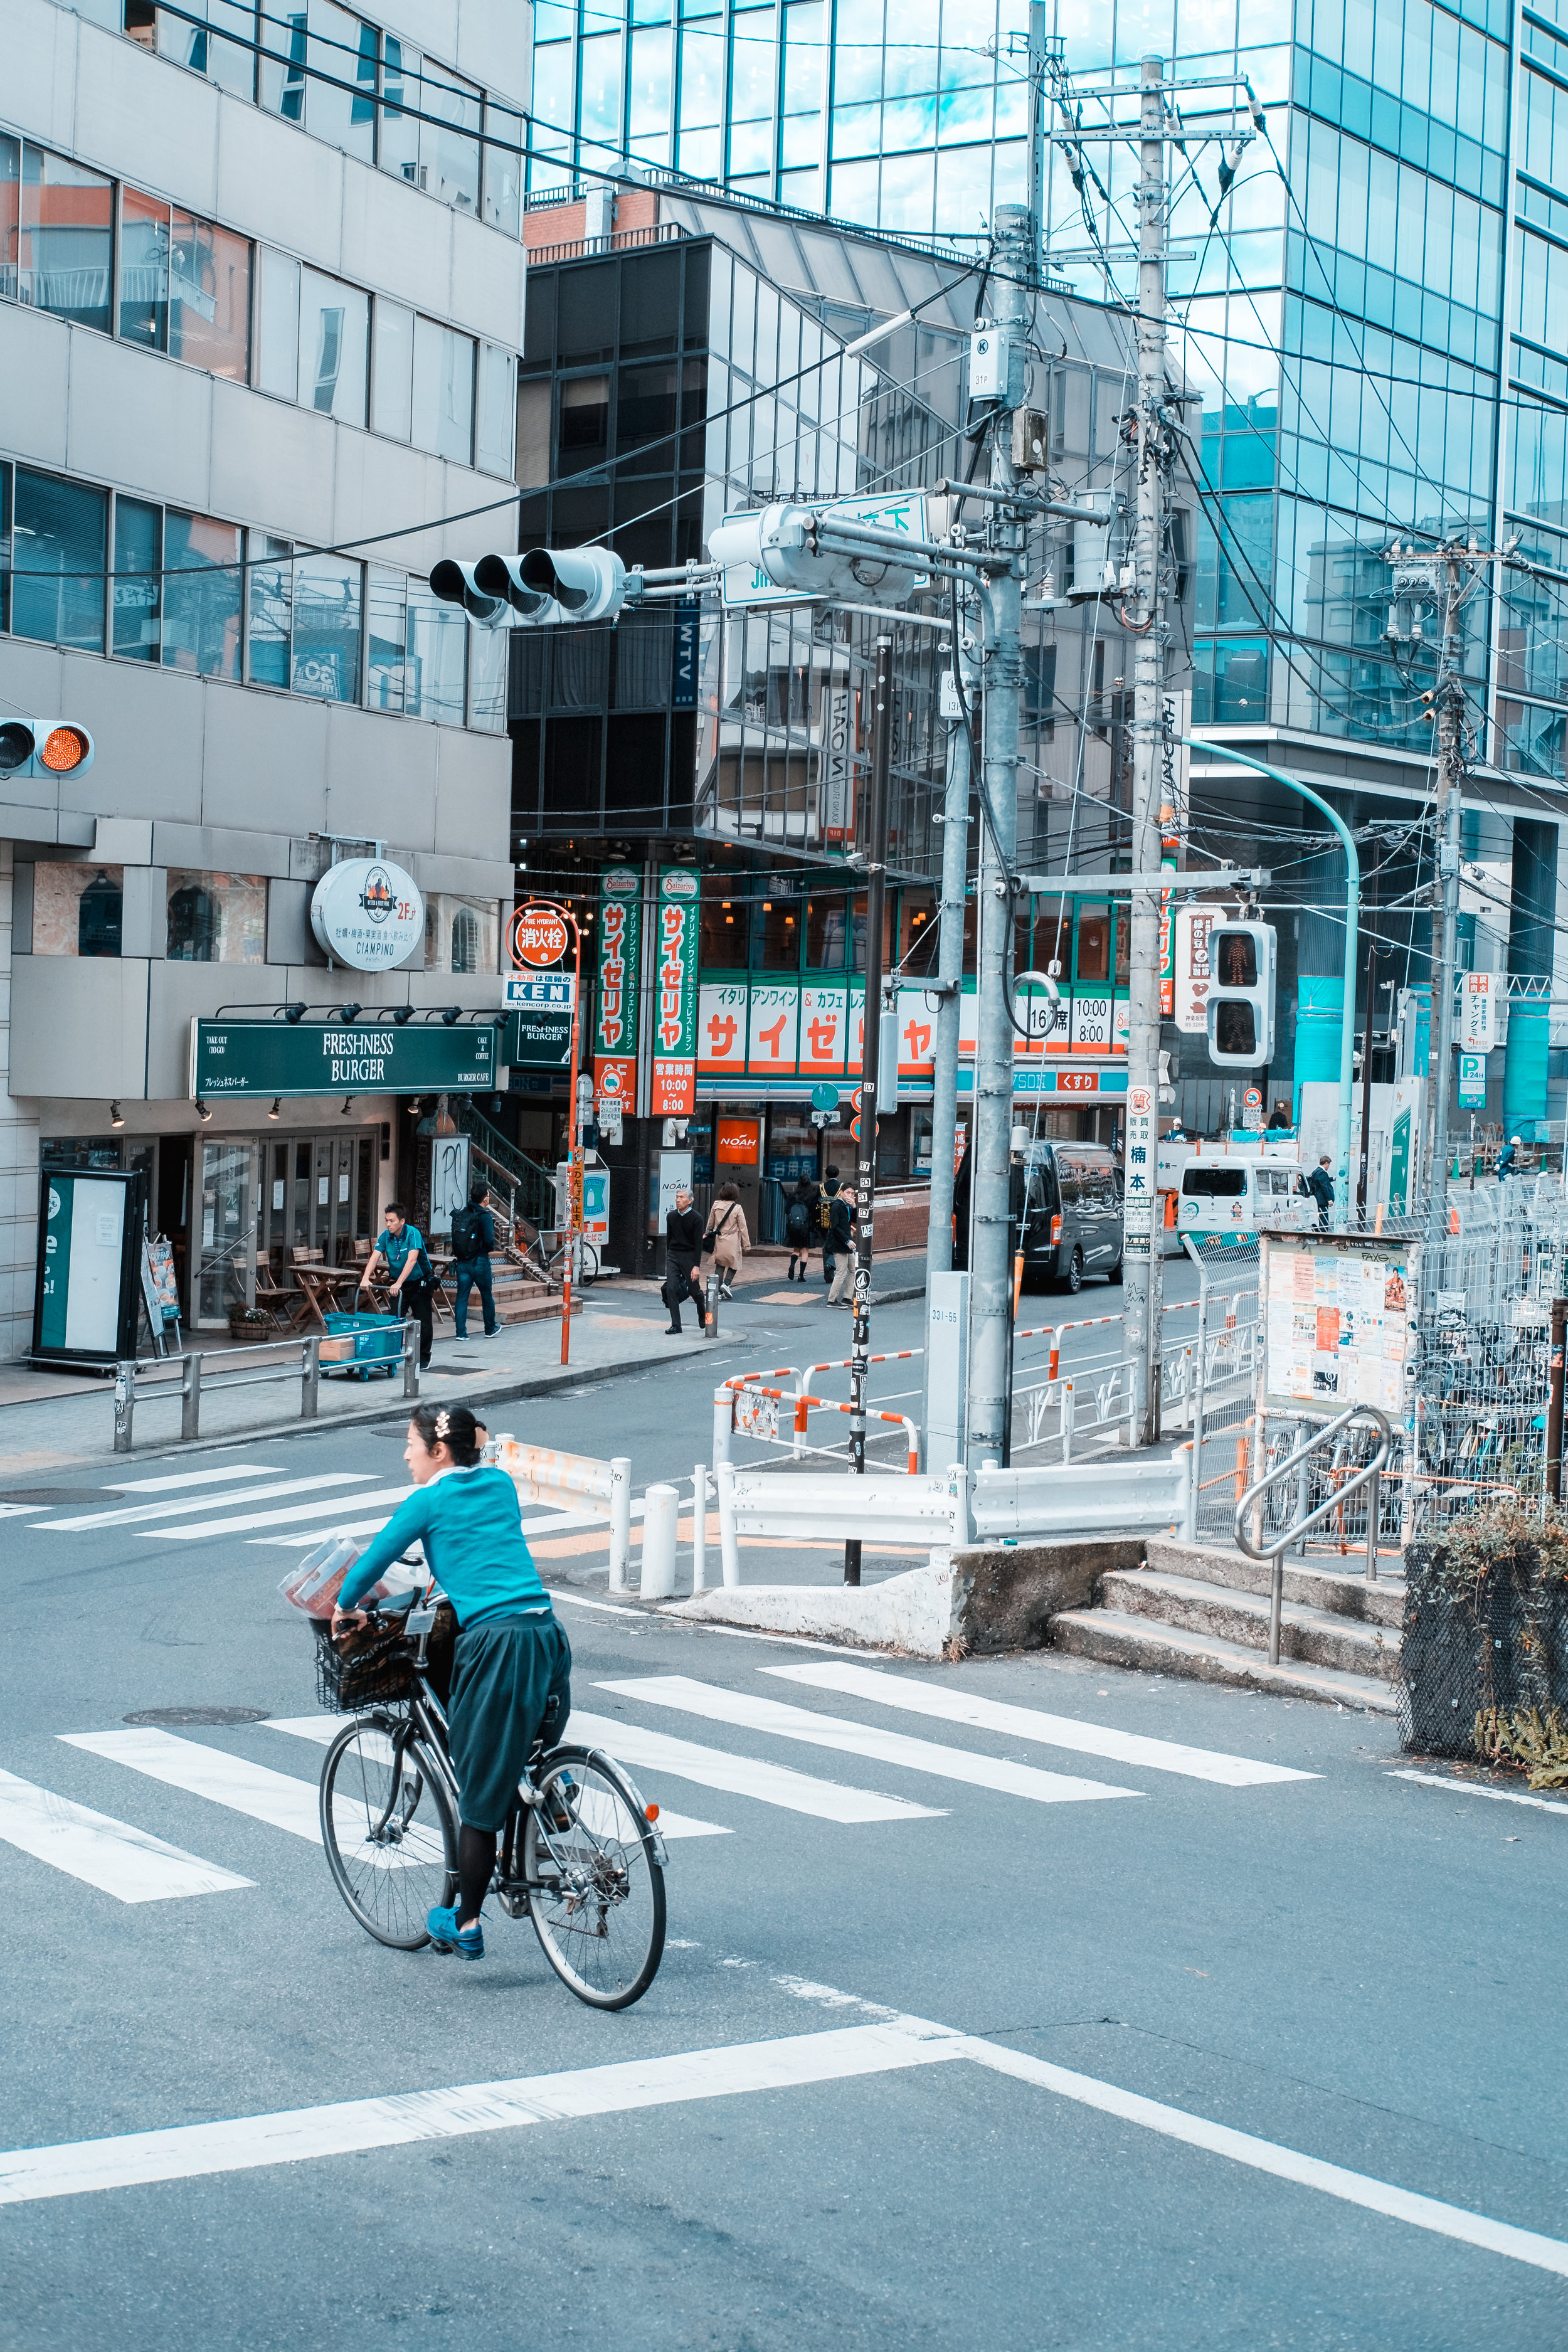 Tokyo_Nov_2018_AdamDillon_DSCF1099.jpg